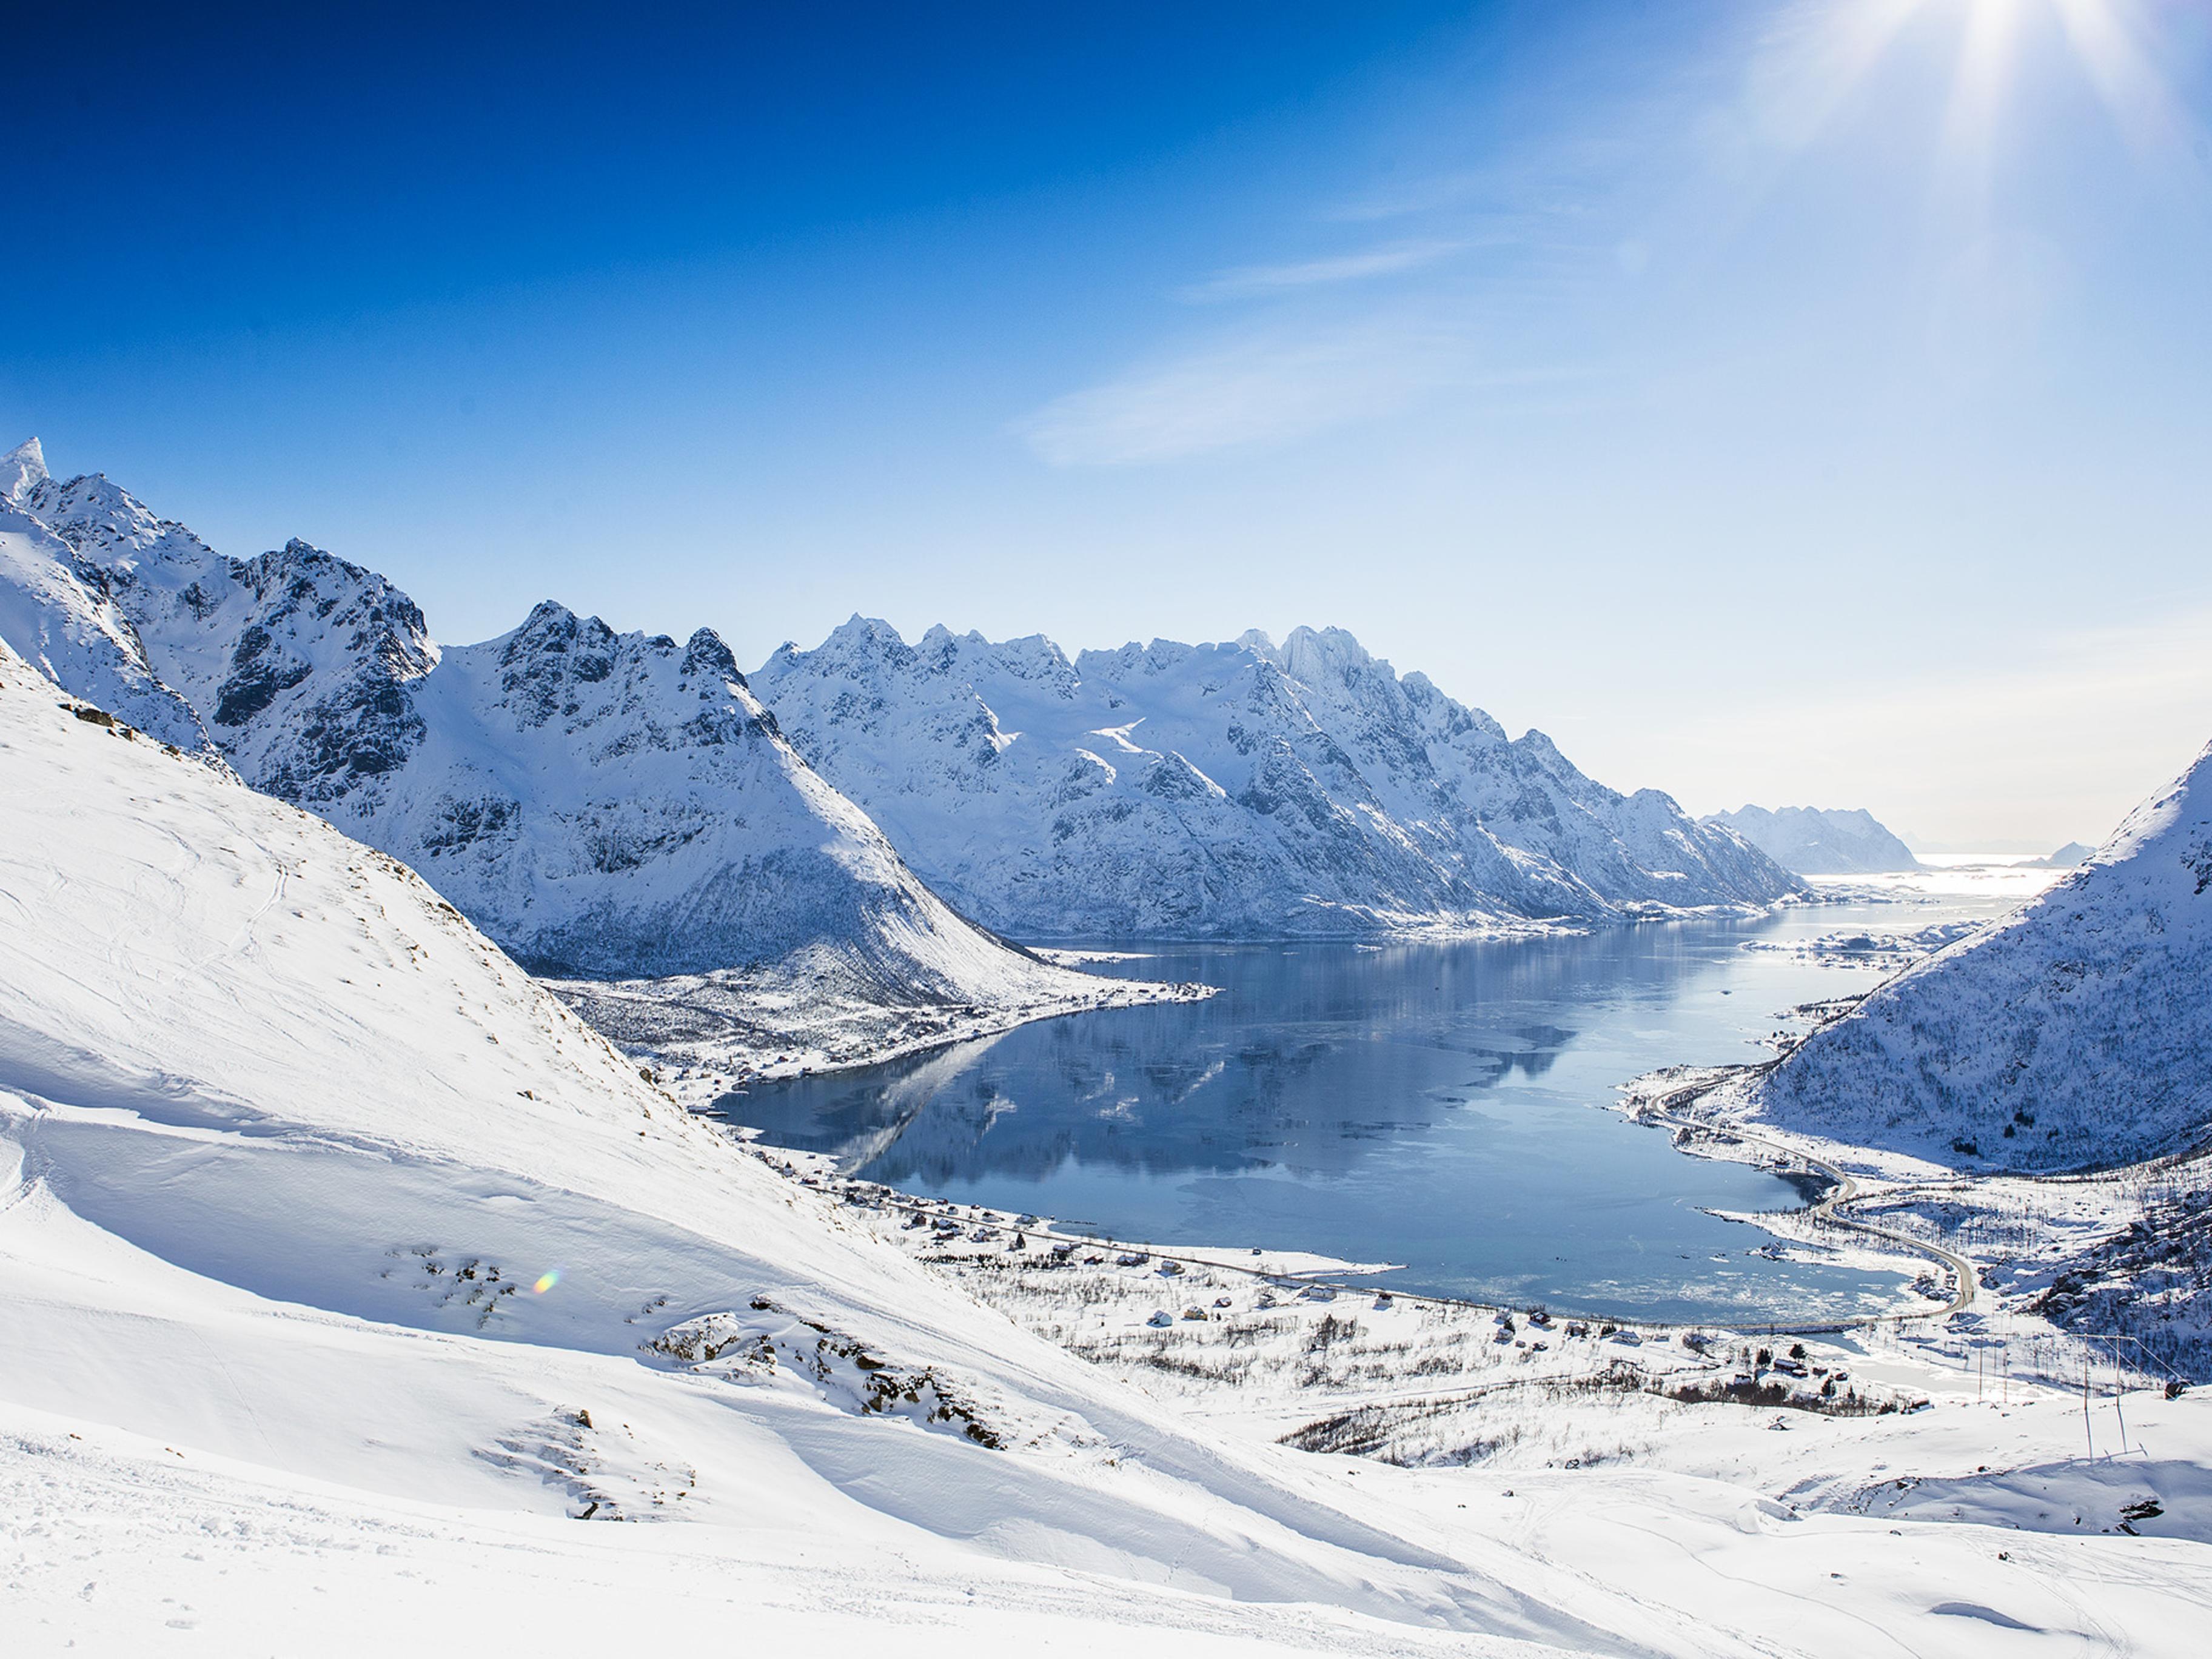 Austnes fjord, Lofoten. Photo: Mats Grimsæth